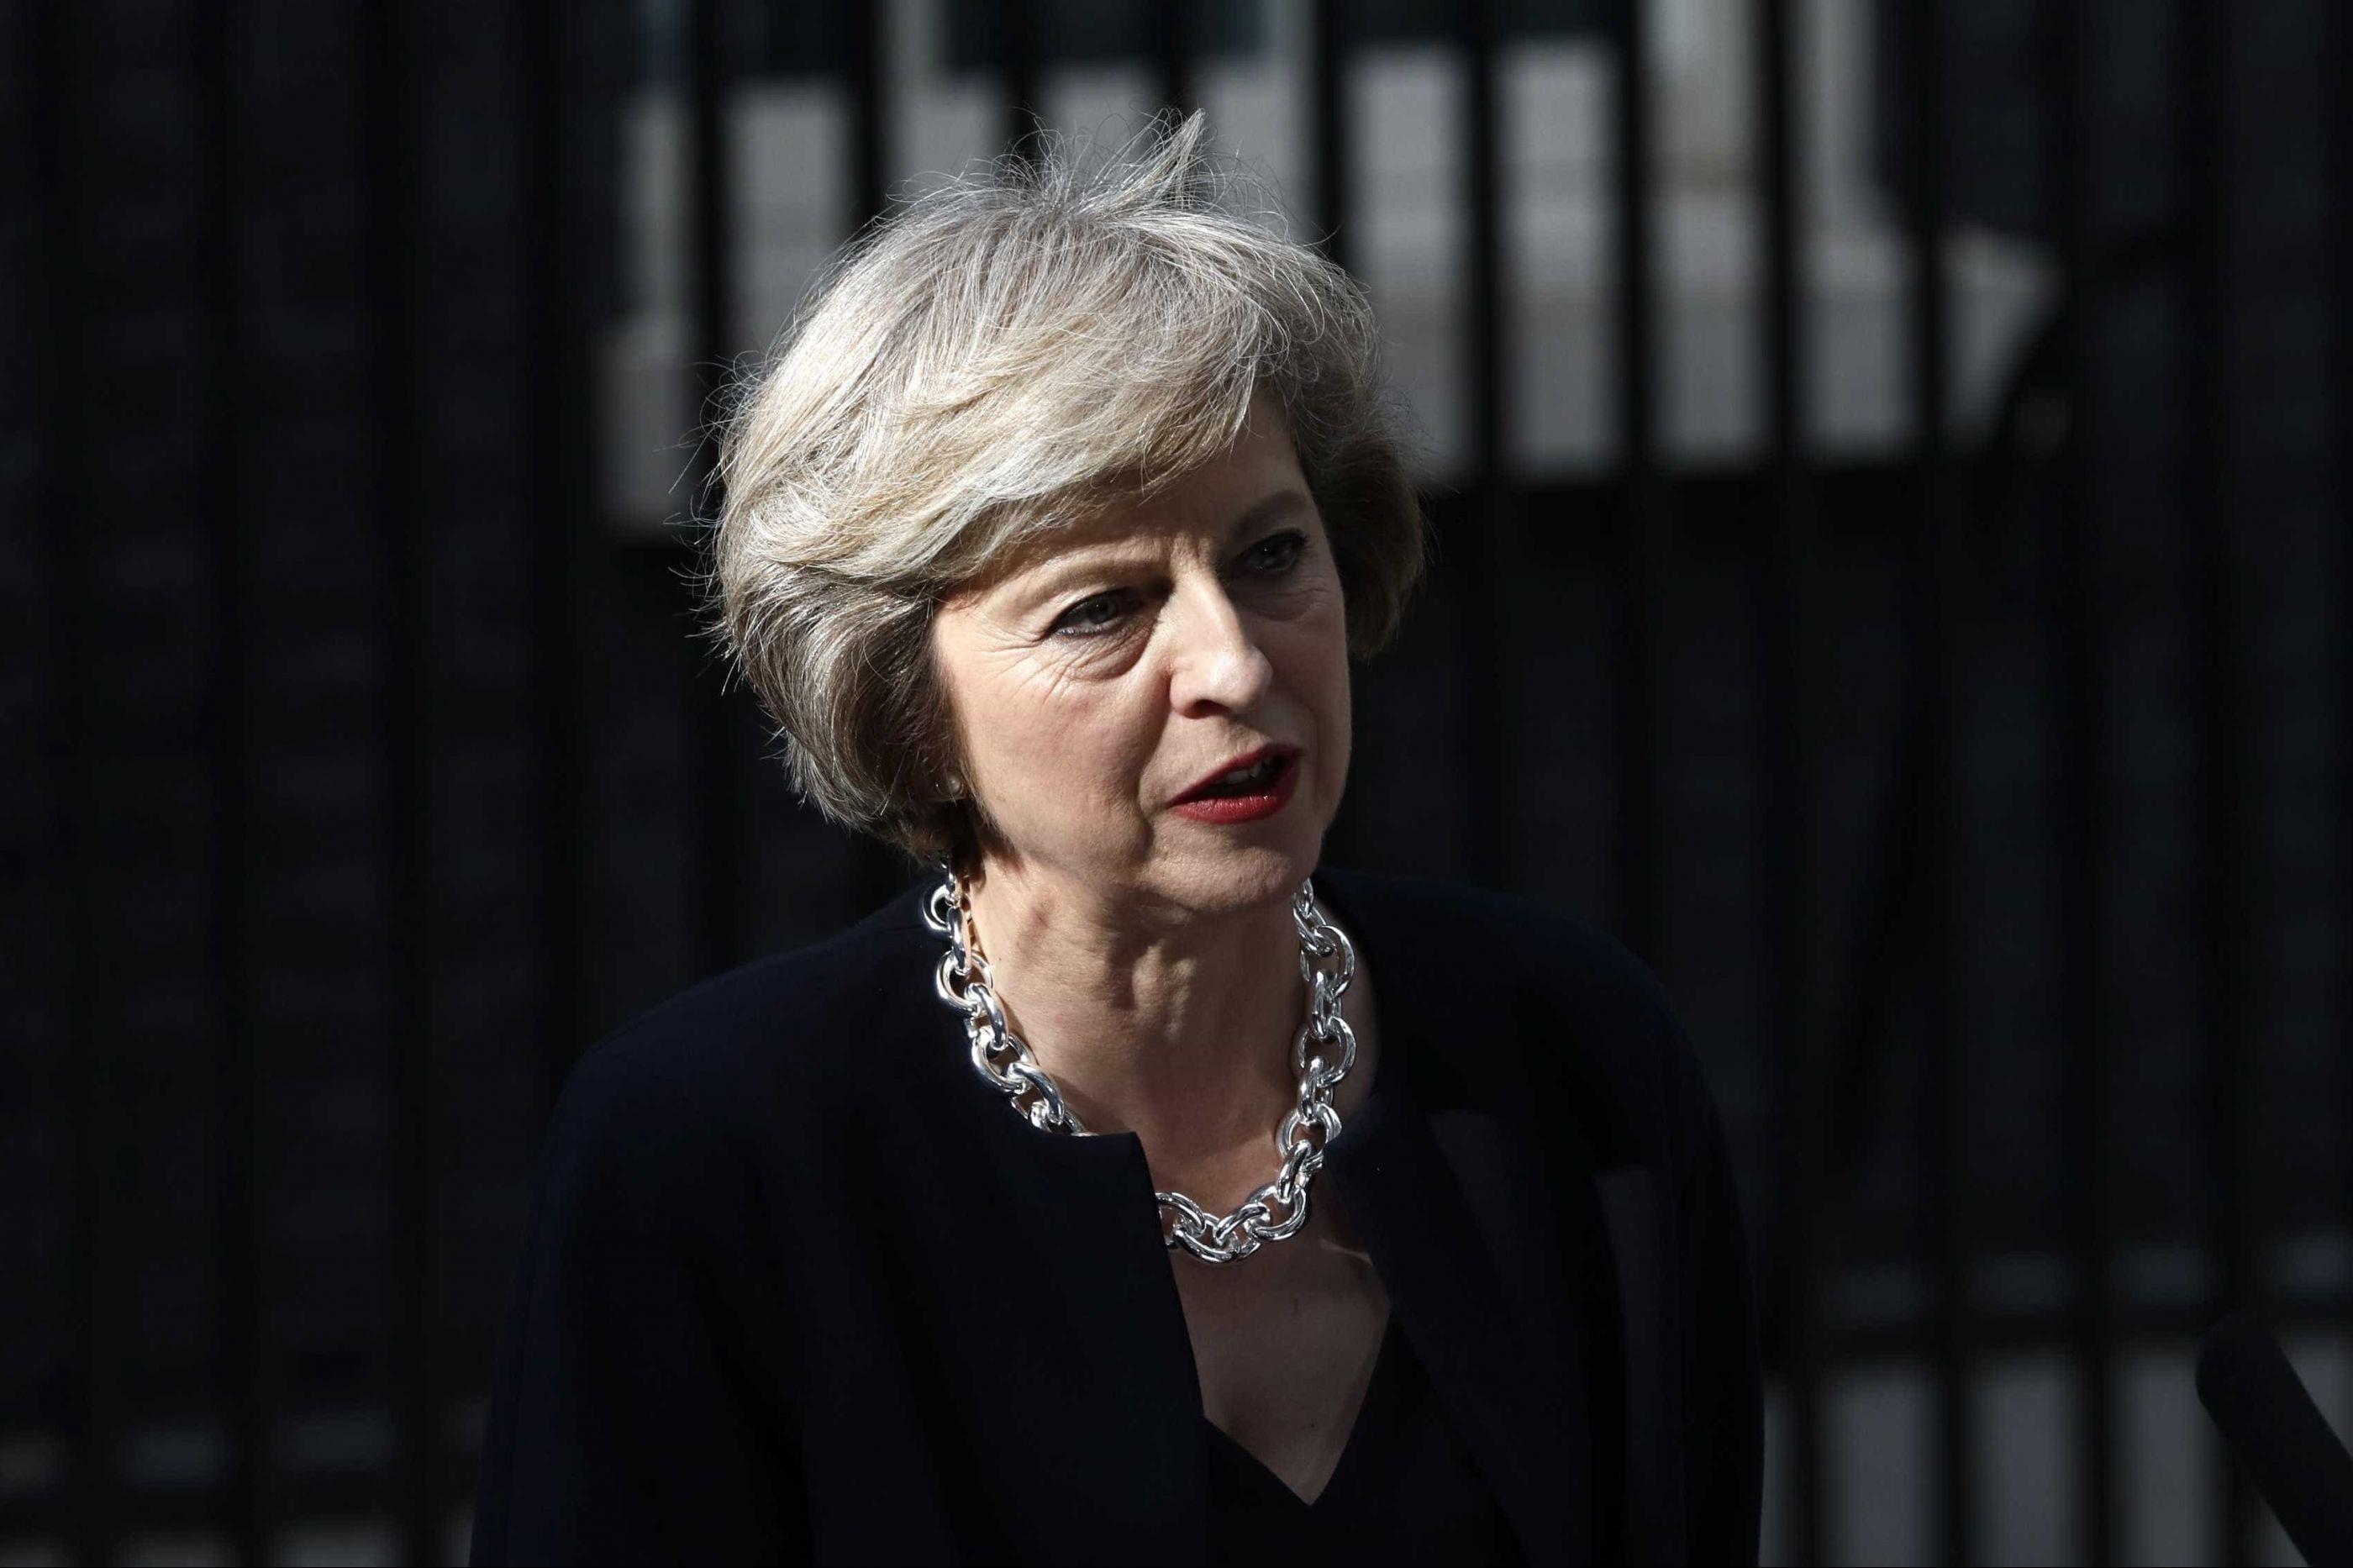 Brexit: Theresa May pondera antecipar eleições, diz jornal